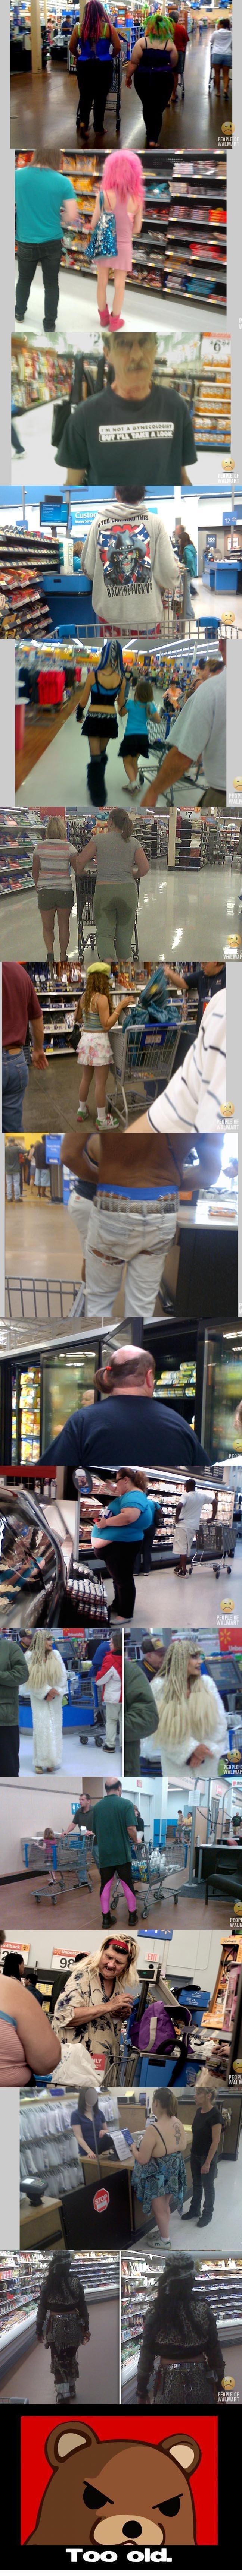 People of Walmart. . dath Too 'old.. copy me more, i please Walmart People lolz